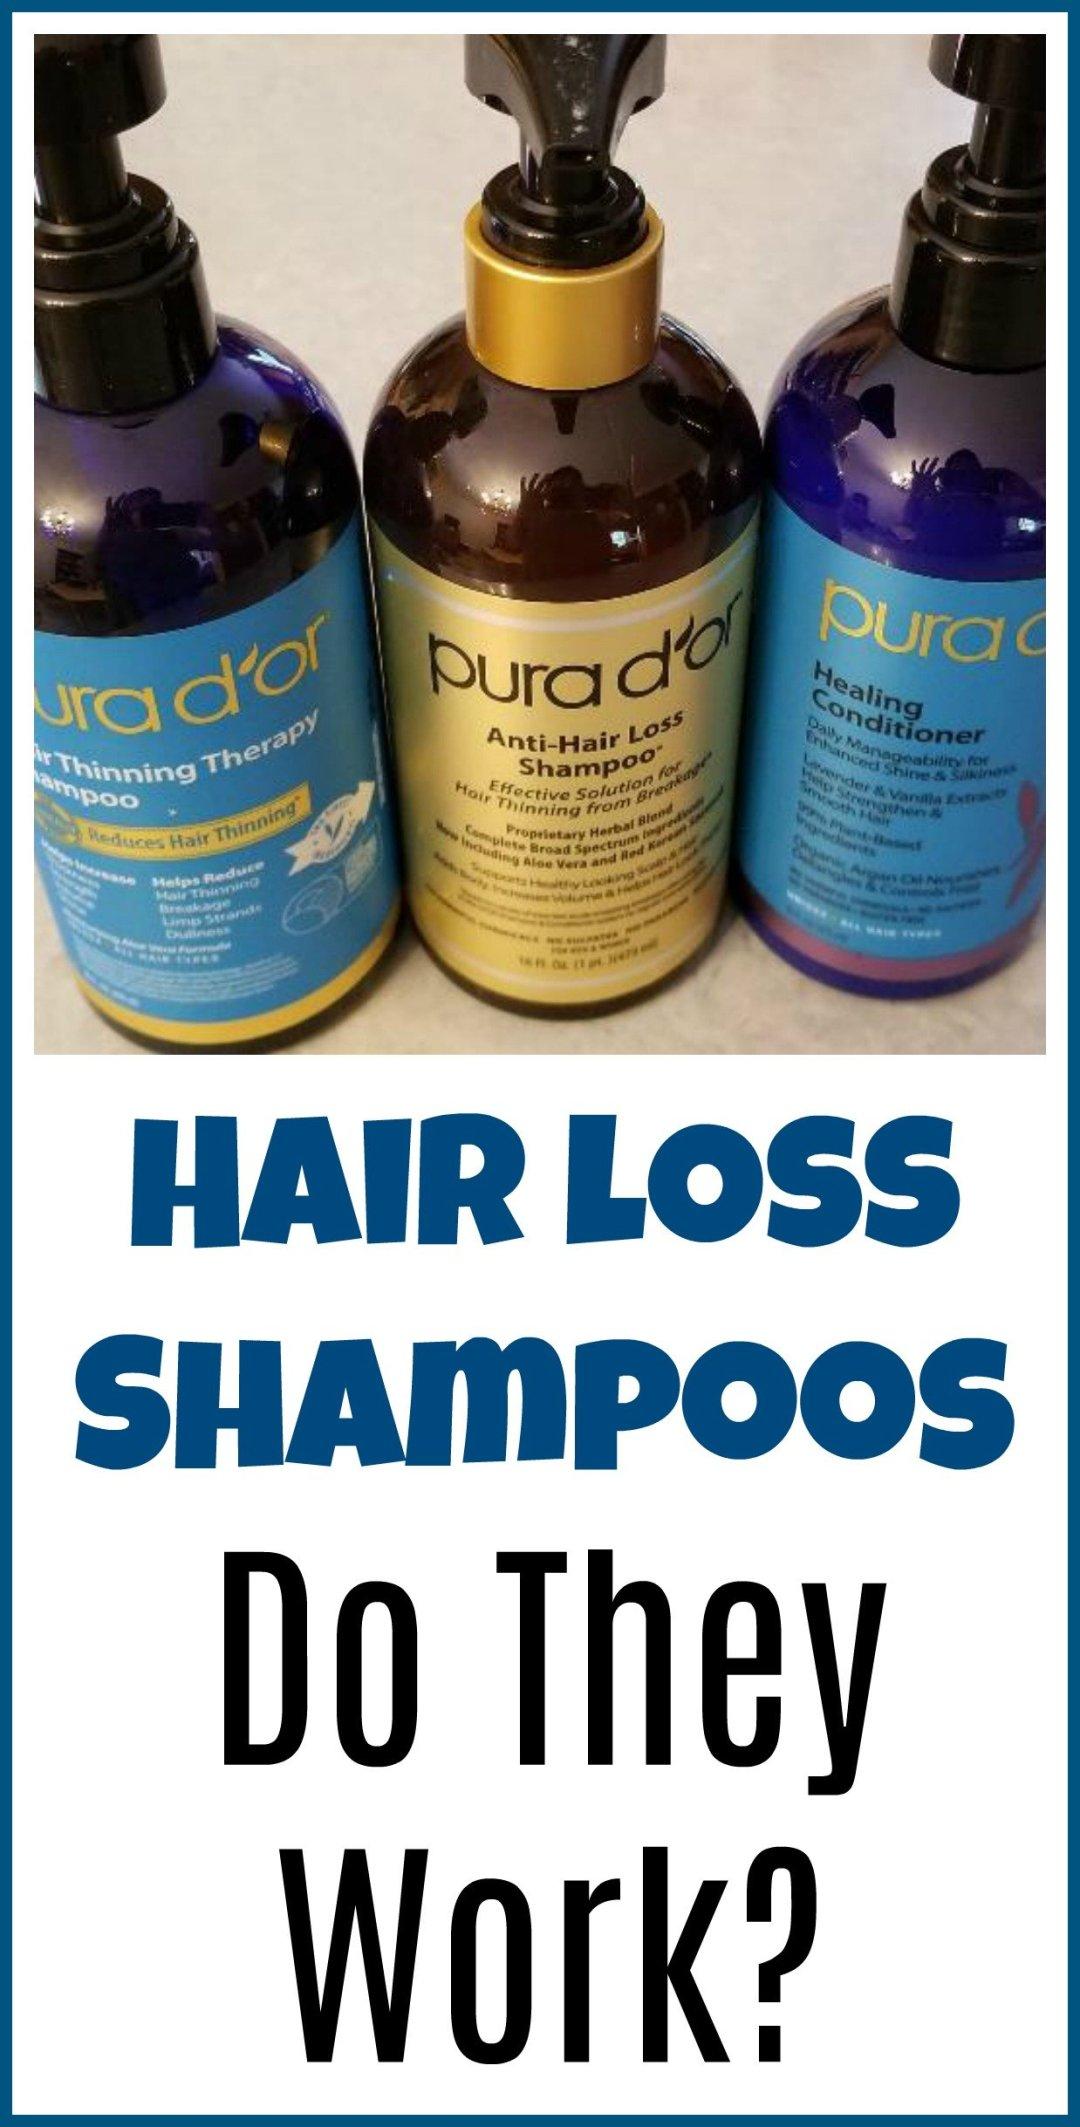 Do hair loss shampoos work